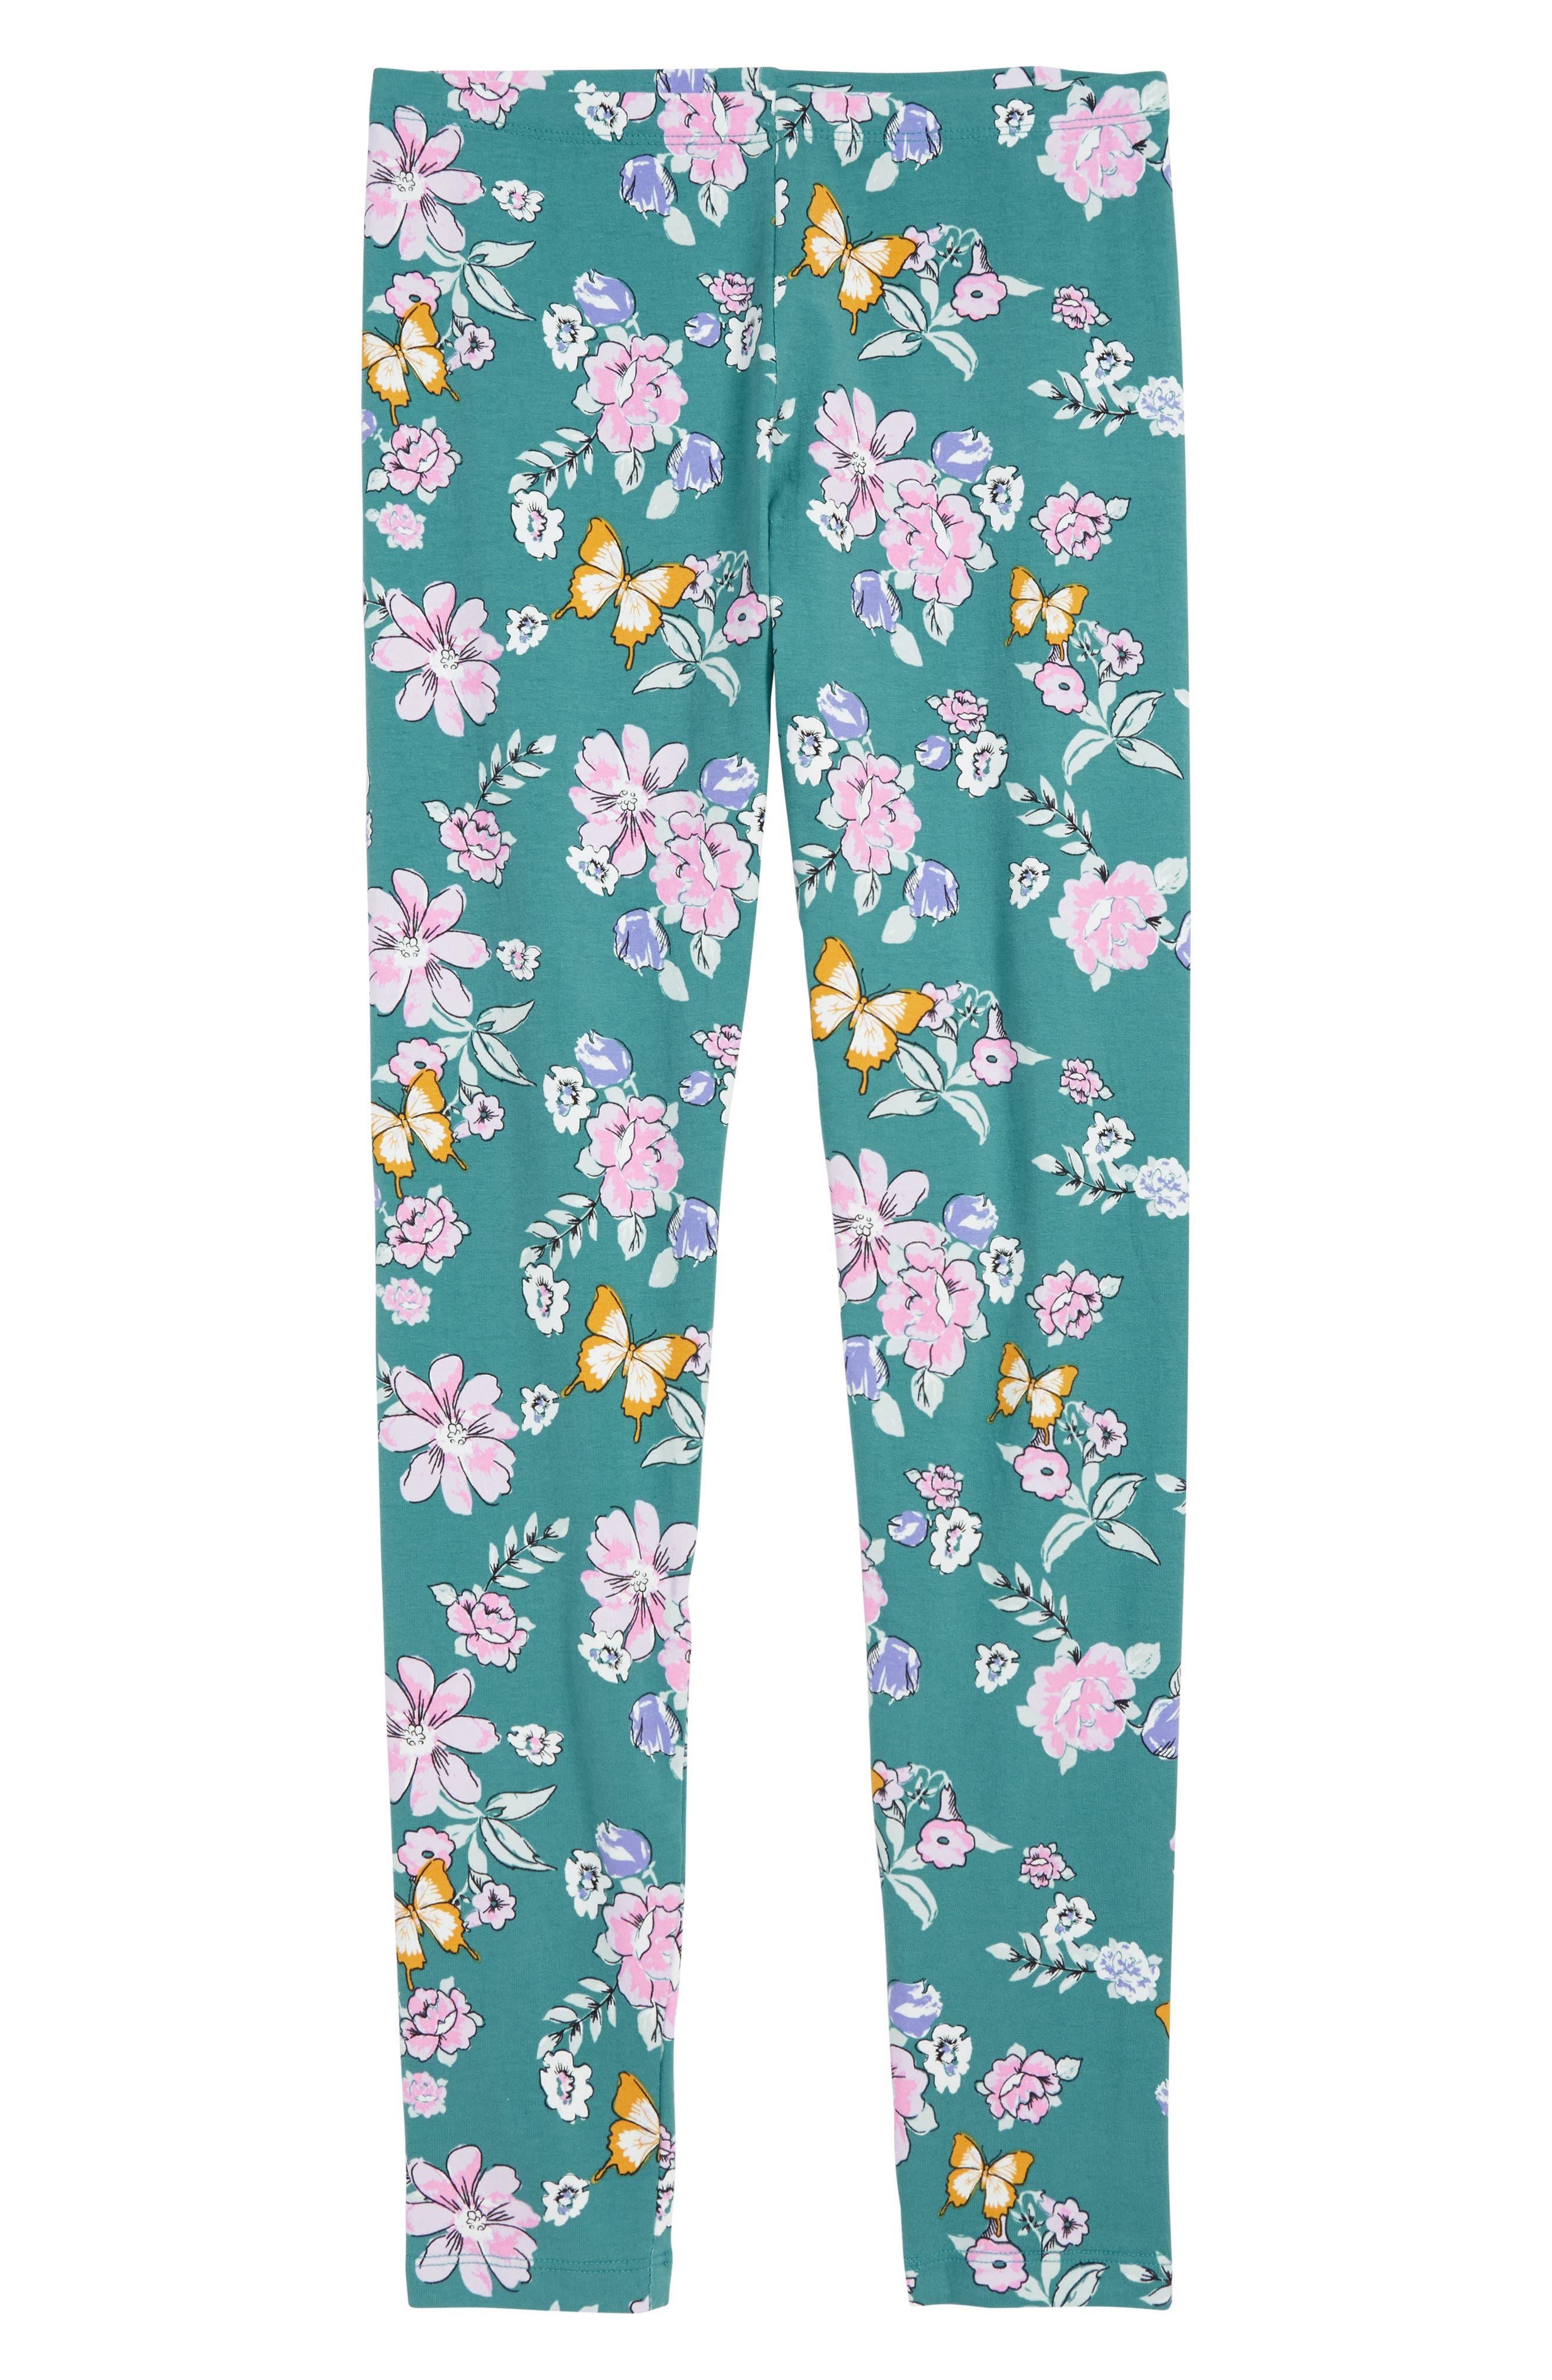 Lara Floral Blossom Leggings,                             Main thumbnail 1, color,                             TEAL